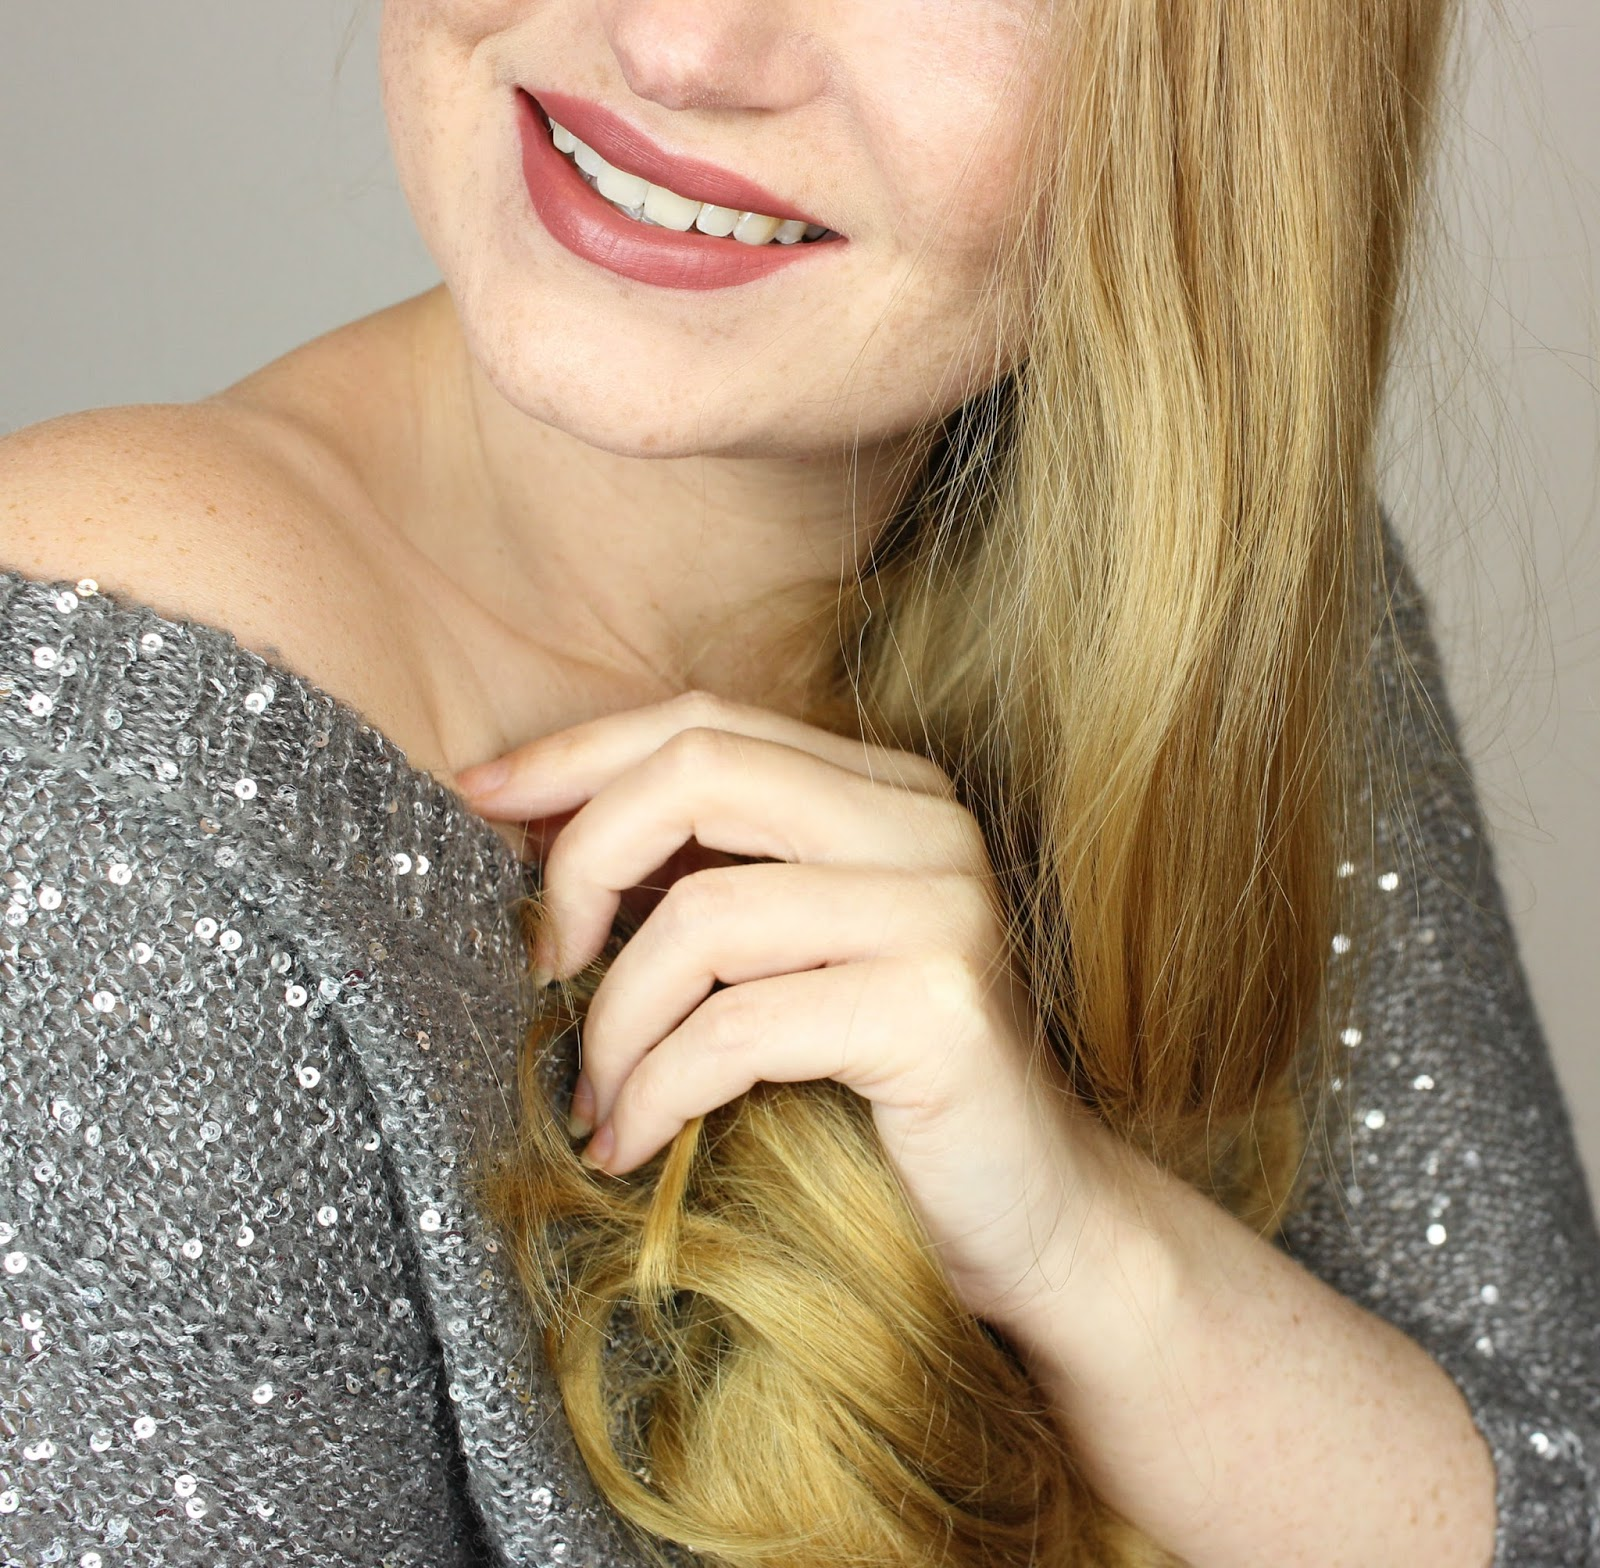 beauty, frisuren für langes haar, Glamouröse Haarträume, glanz, haar glätten, haare stylen, Keramikplatten, locken, Philips, review, silvester, StraightCare Advanced Glätteisen, Wellen, weniger spliss,